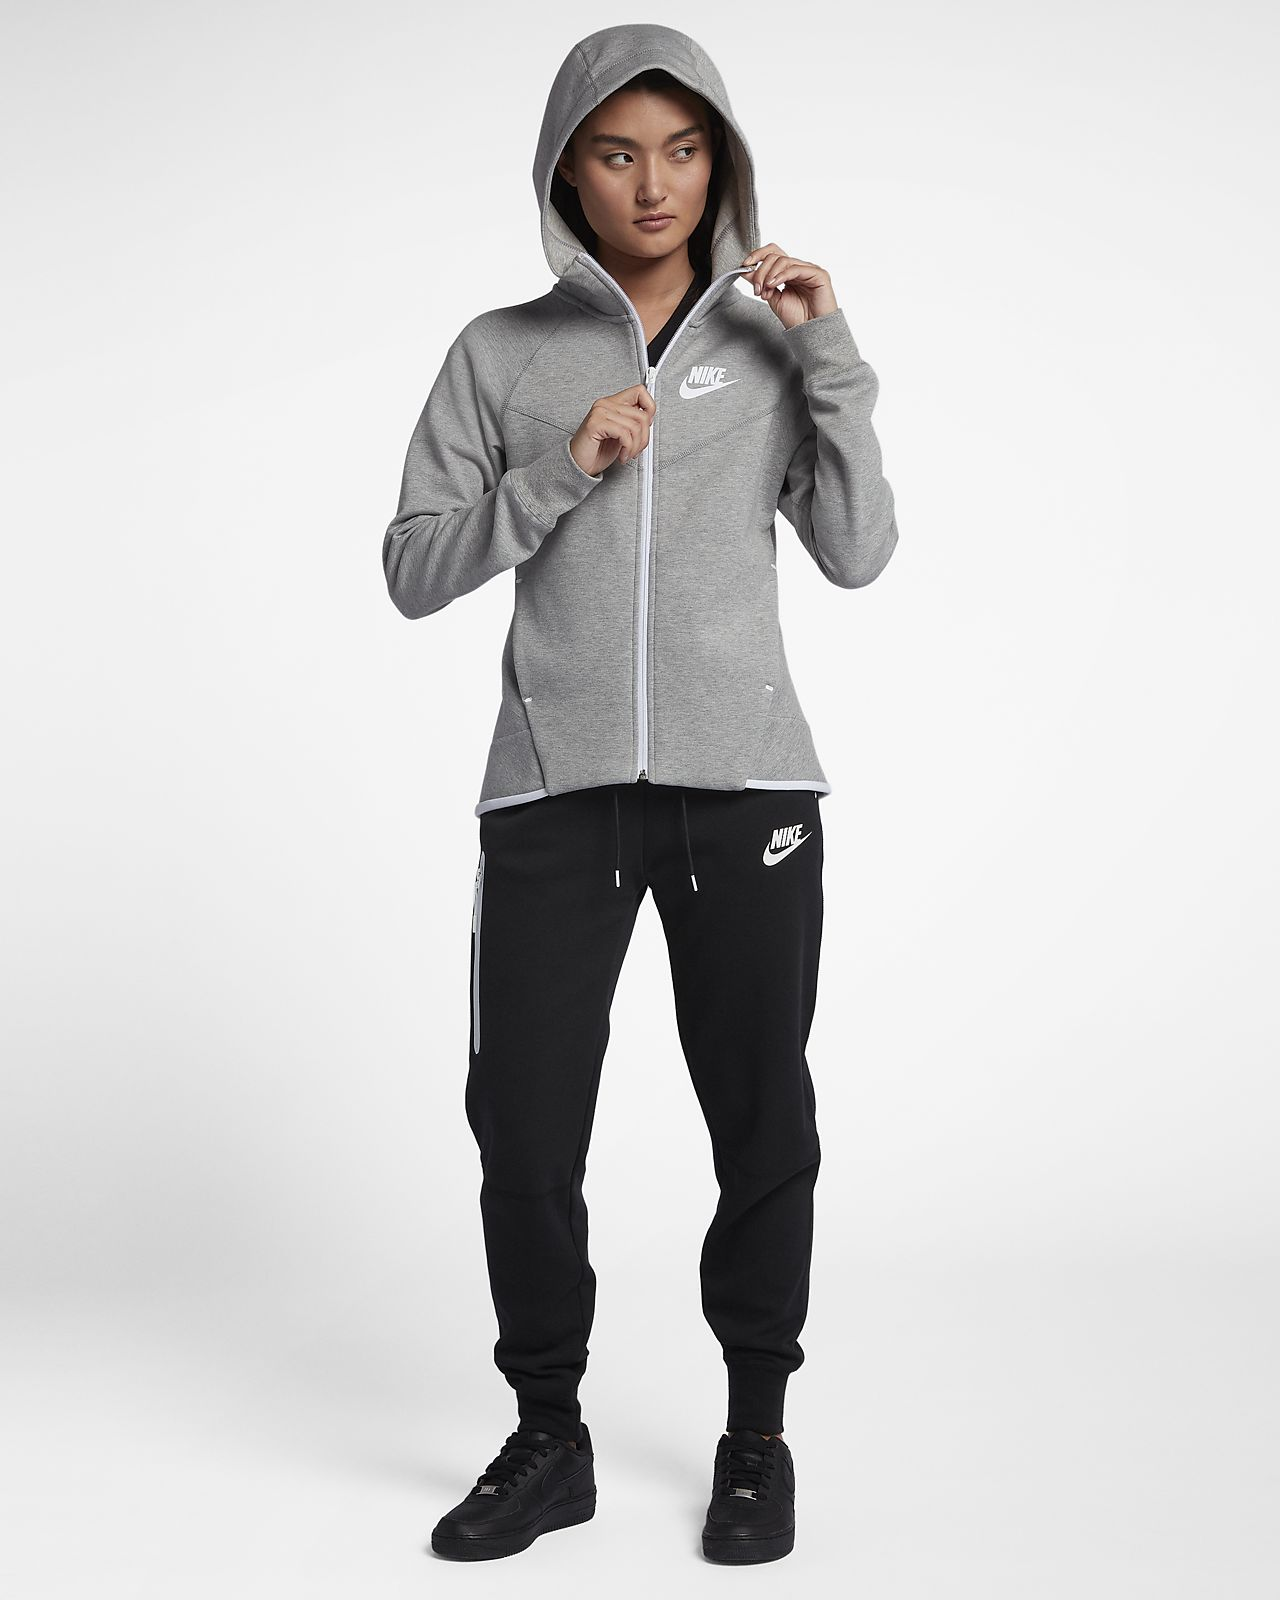 Nike Sportswear Tech Fleece Windrunner Damen Hoodie mit durchgehendem Reißverschluss